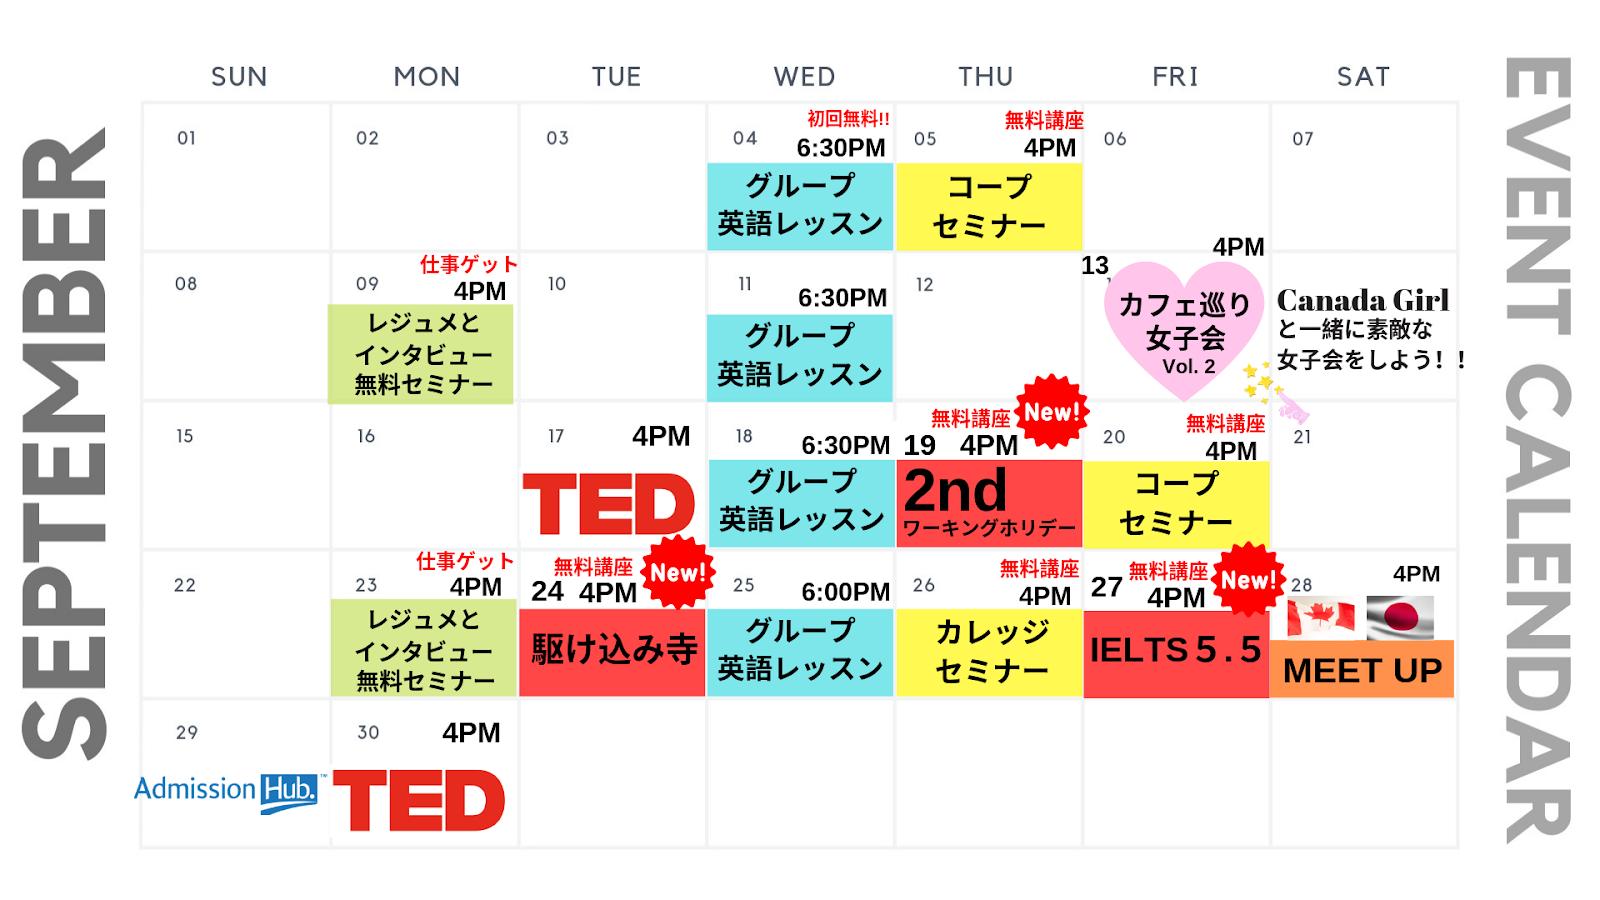 AdmissionHub 9月カレンダー